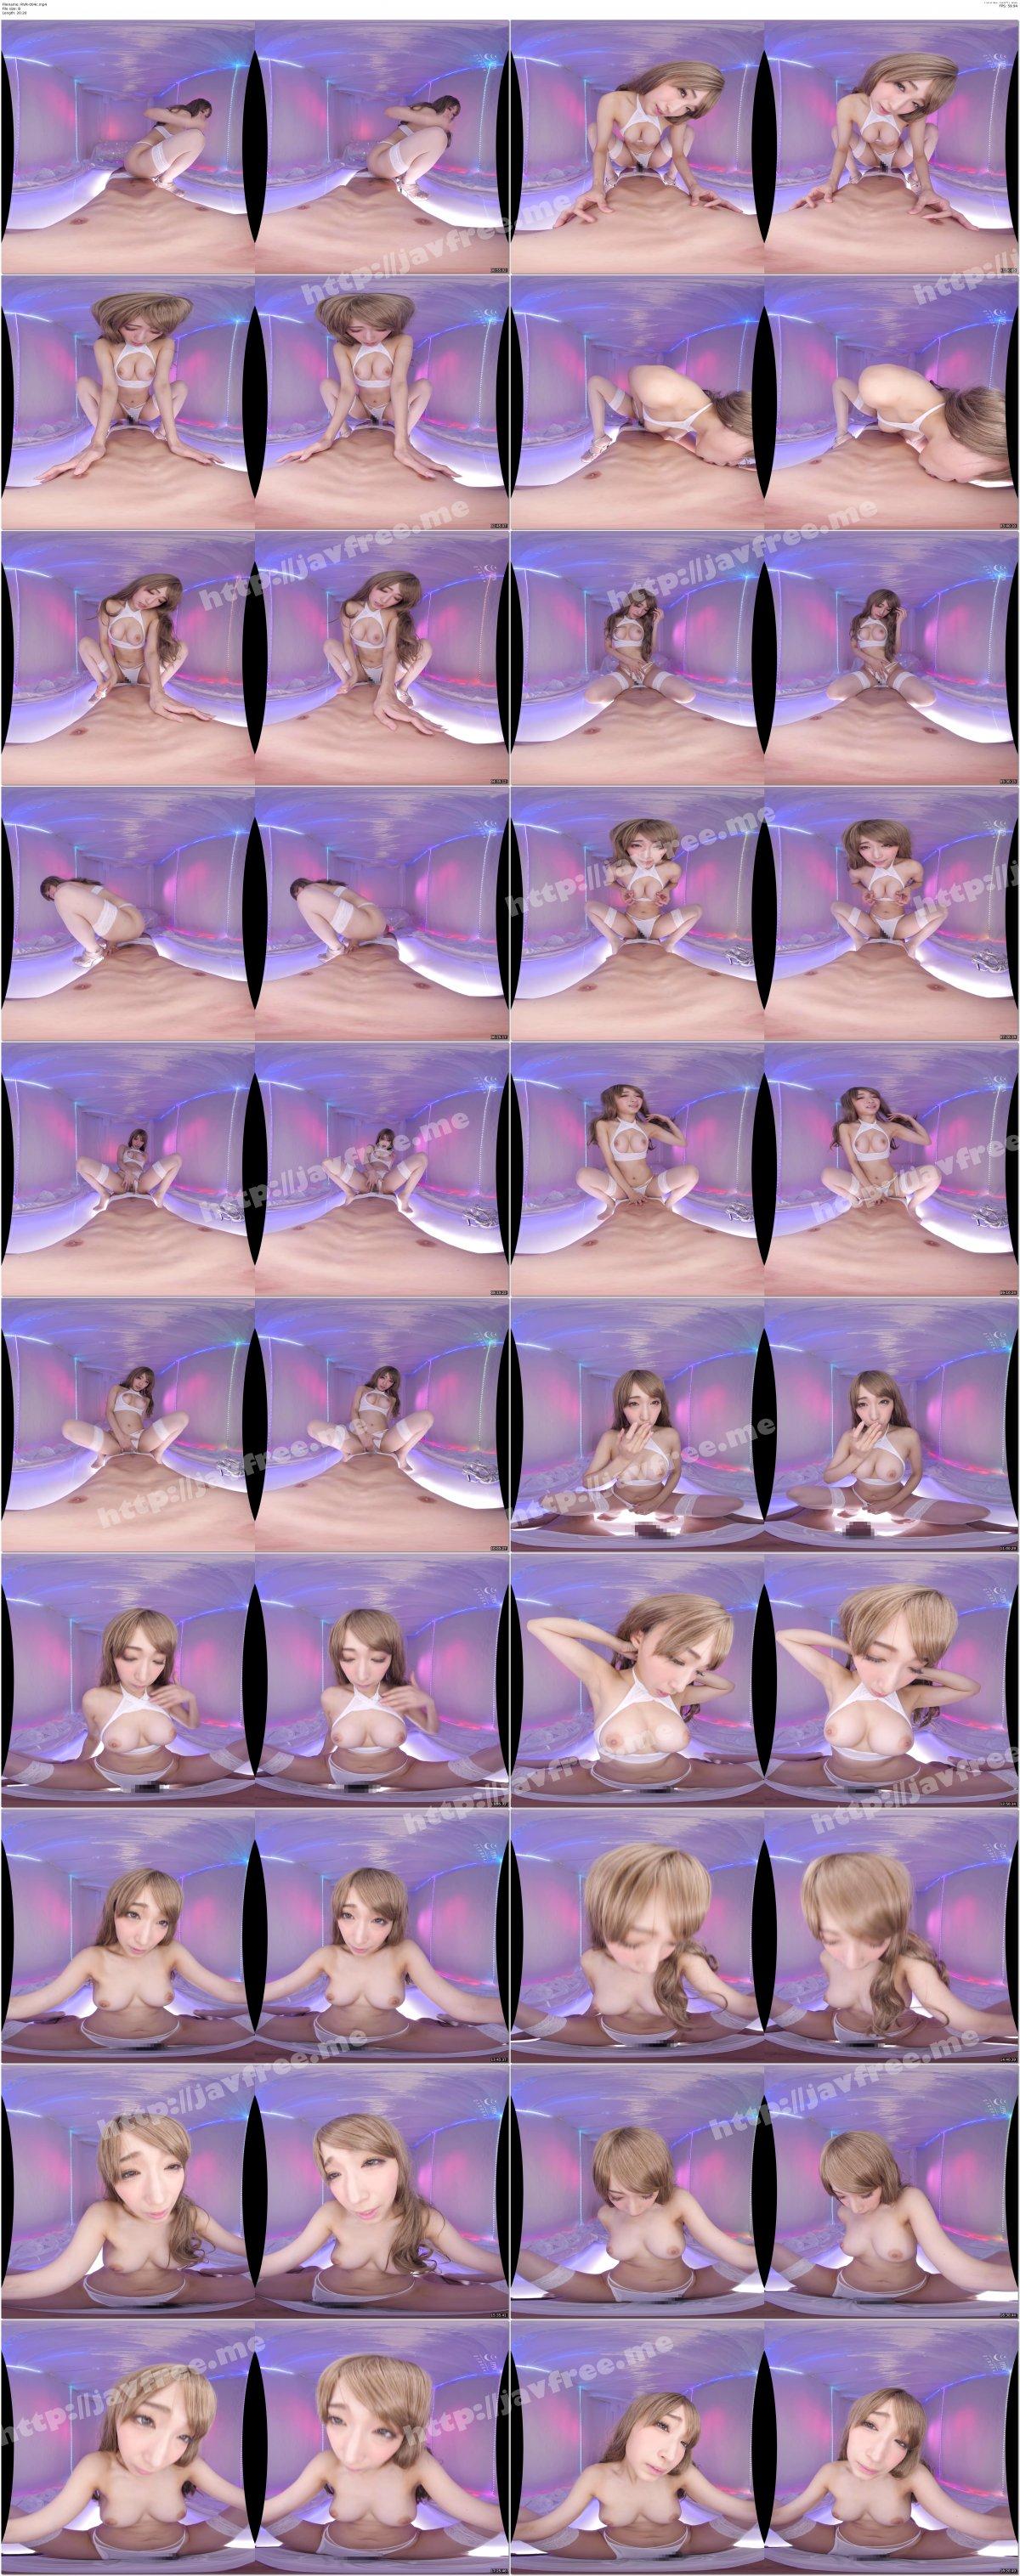 [RVR-004] 【VR】世界で一番エロく見える蓮実クレアの生々しいフェラチオと気持ち良すぎるSEX - image RVR-004c on https://javfree.me